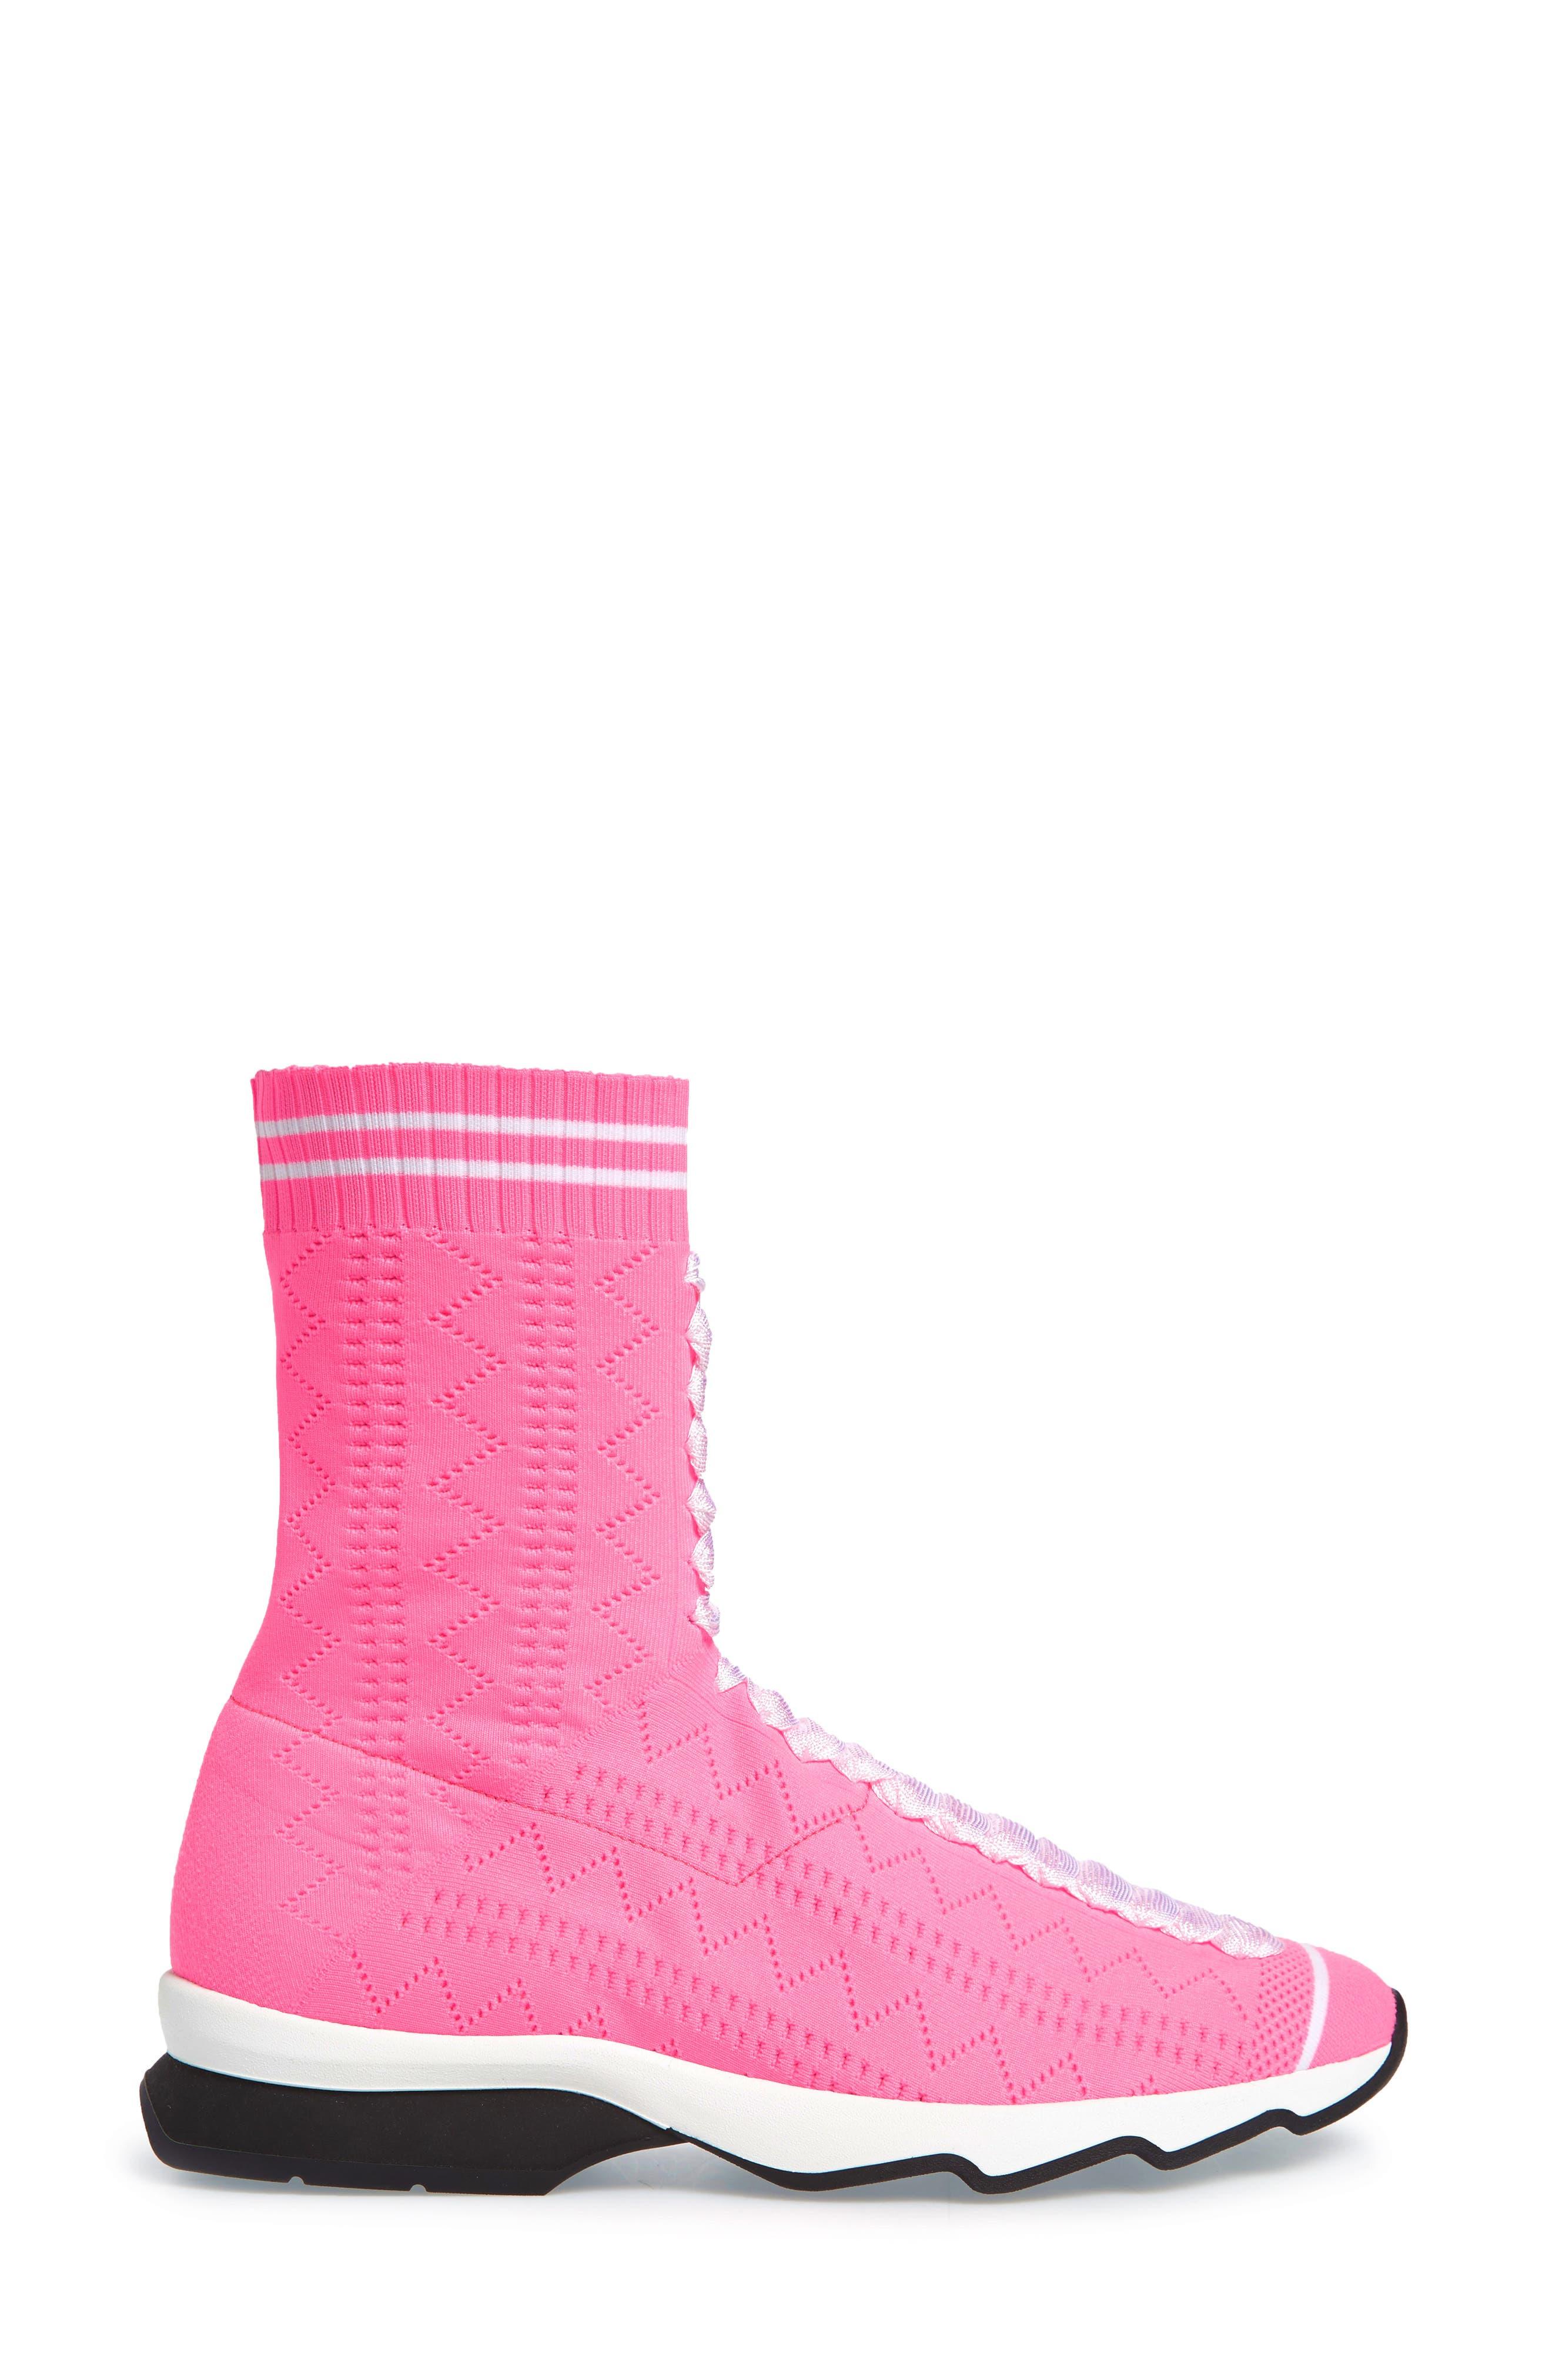 Rocko-Top Sock Sneaker,                             Alternate thumbnail 3, color,                             650